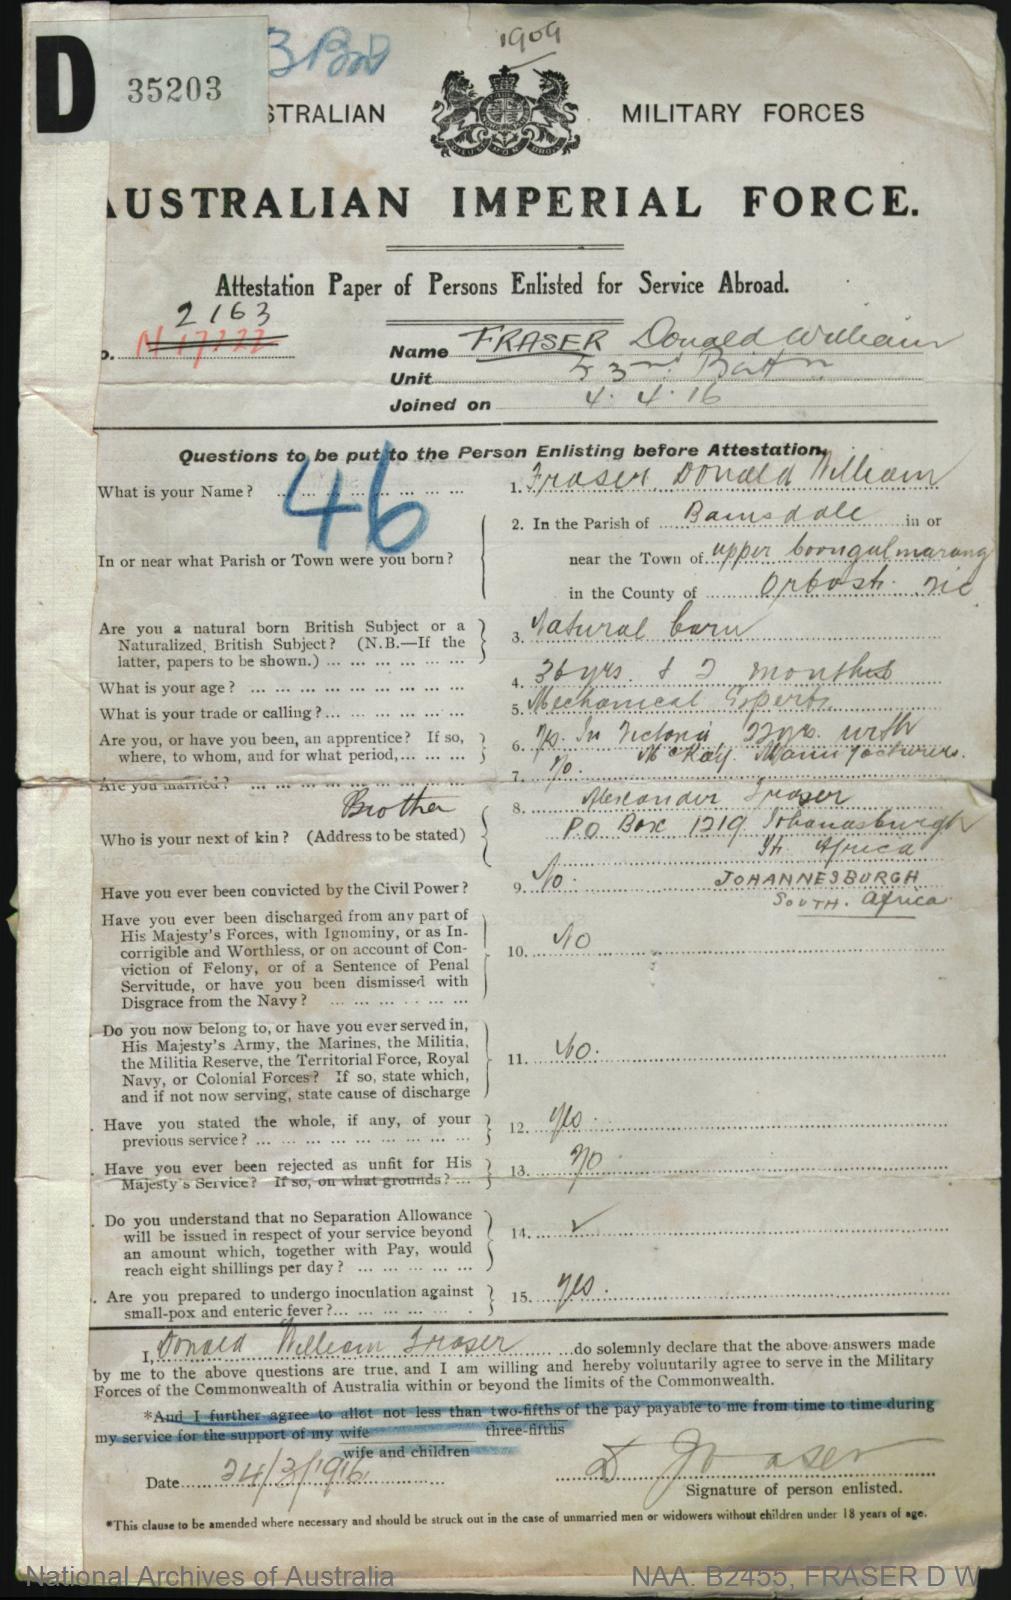 Fraser Donald William : SERN 2163 : POB Bairnsdale VIC : POE Bathurst NSW : NOK B Fraser Alexander